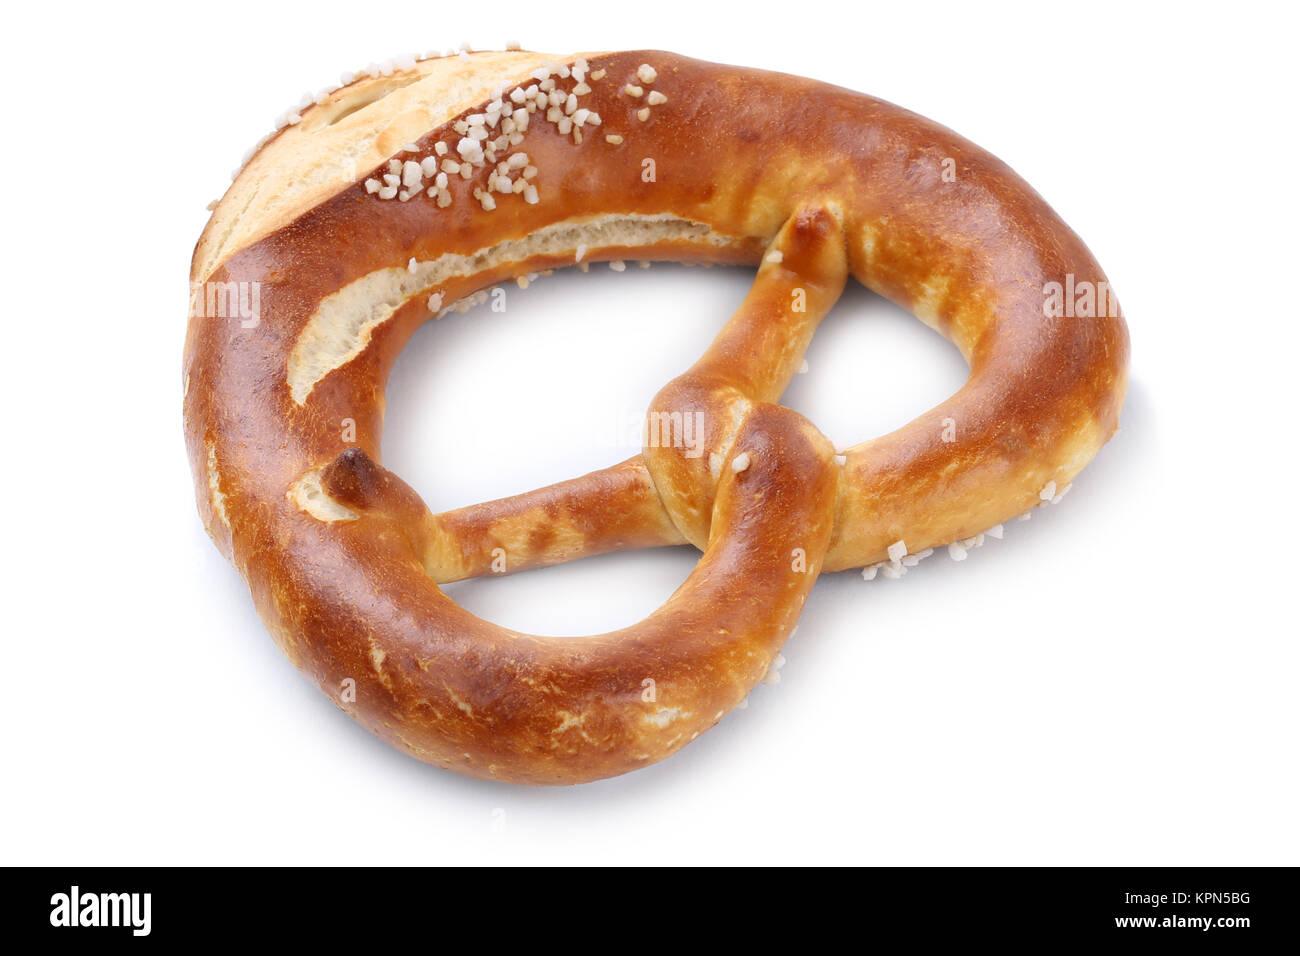 pretzel bretzel exempted isolated for breakfast cut - Stock Image